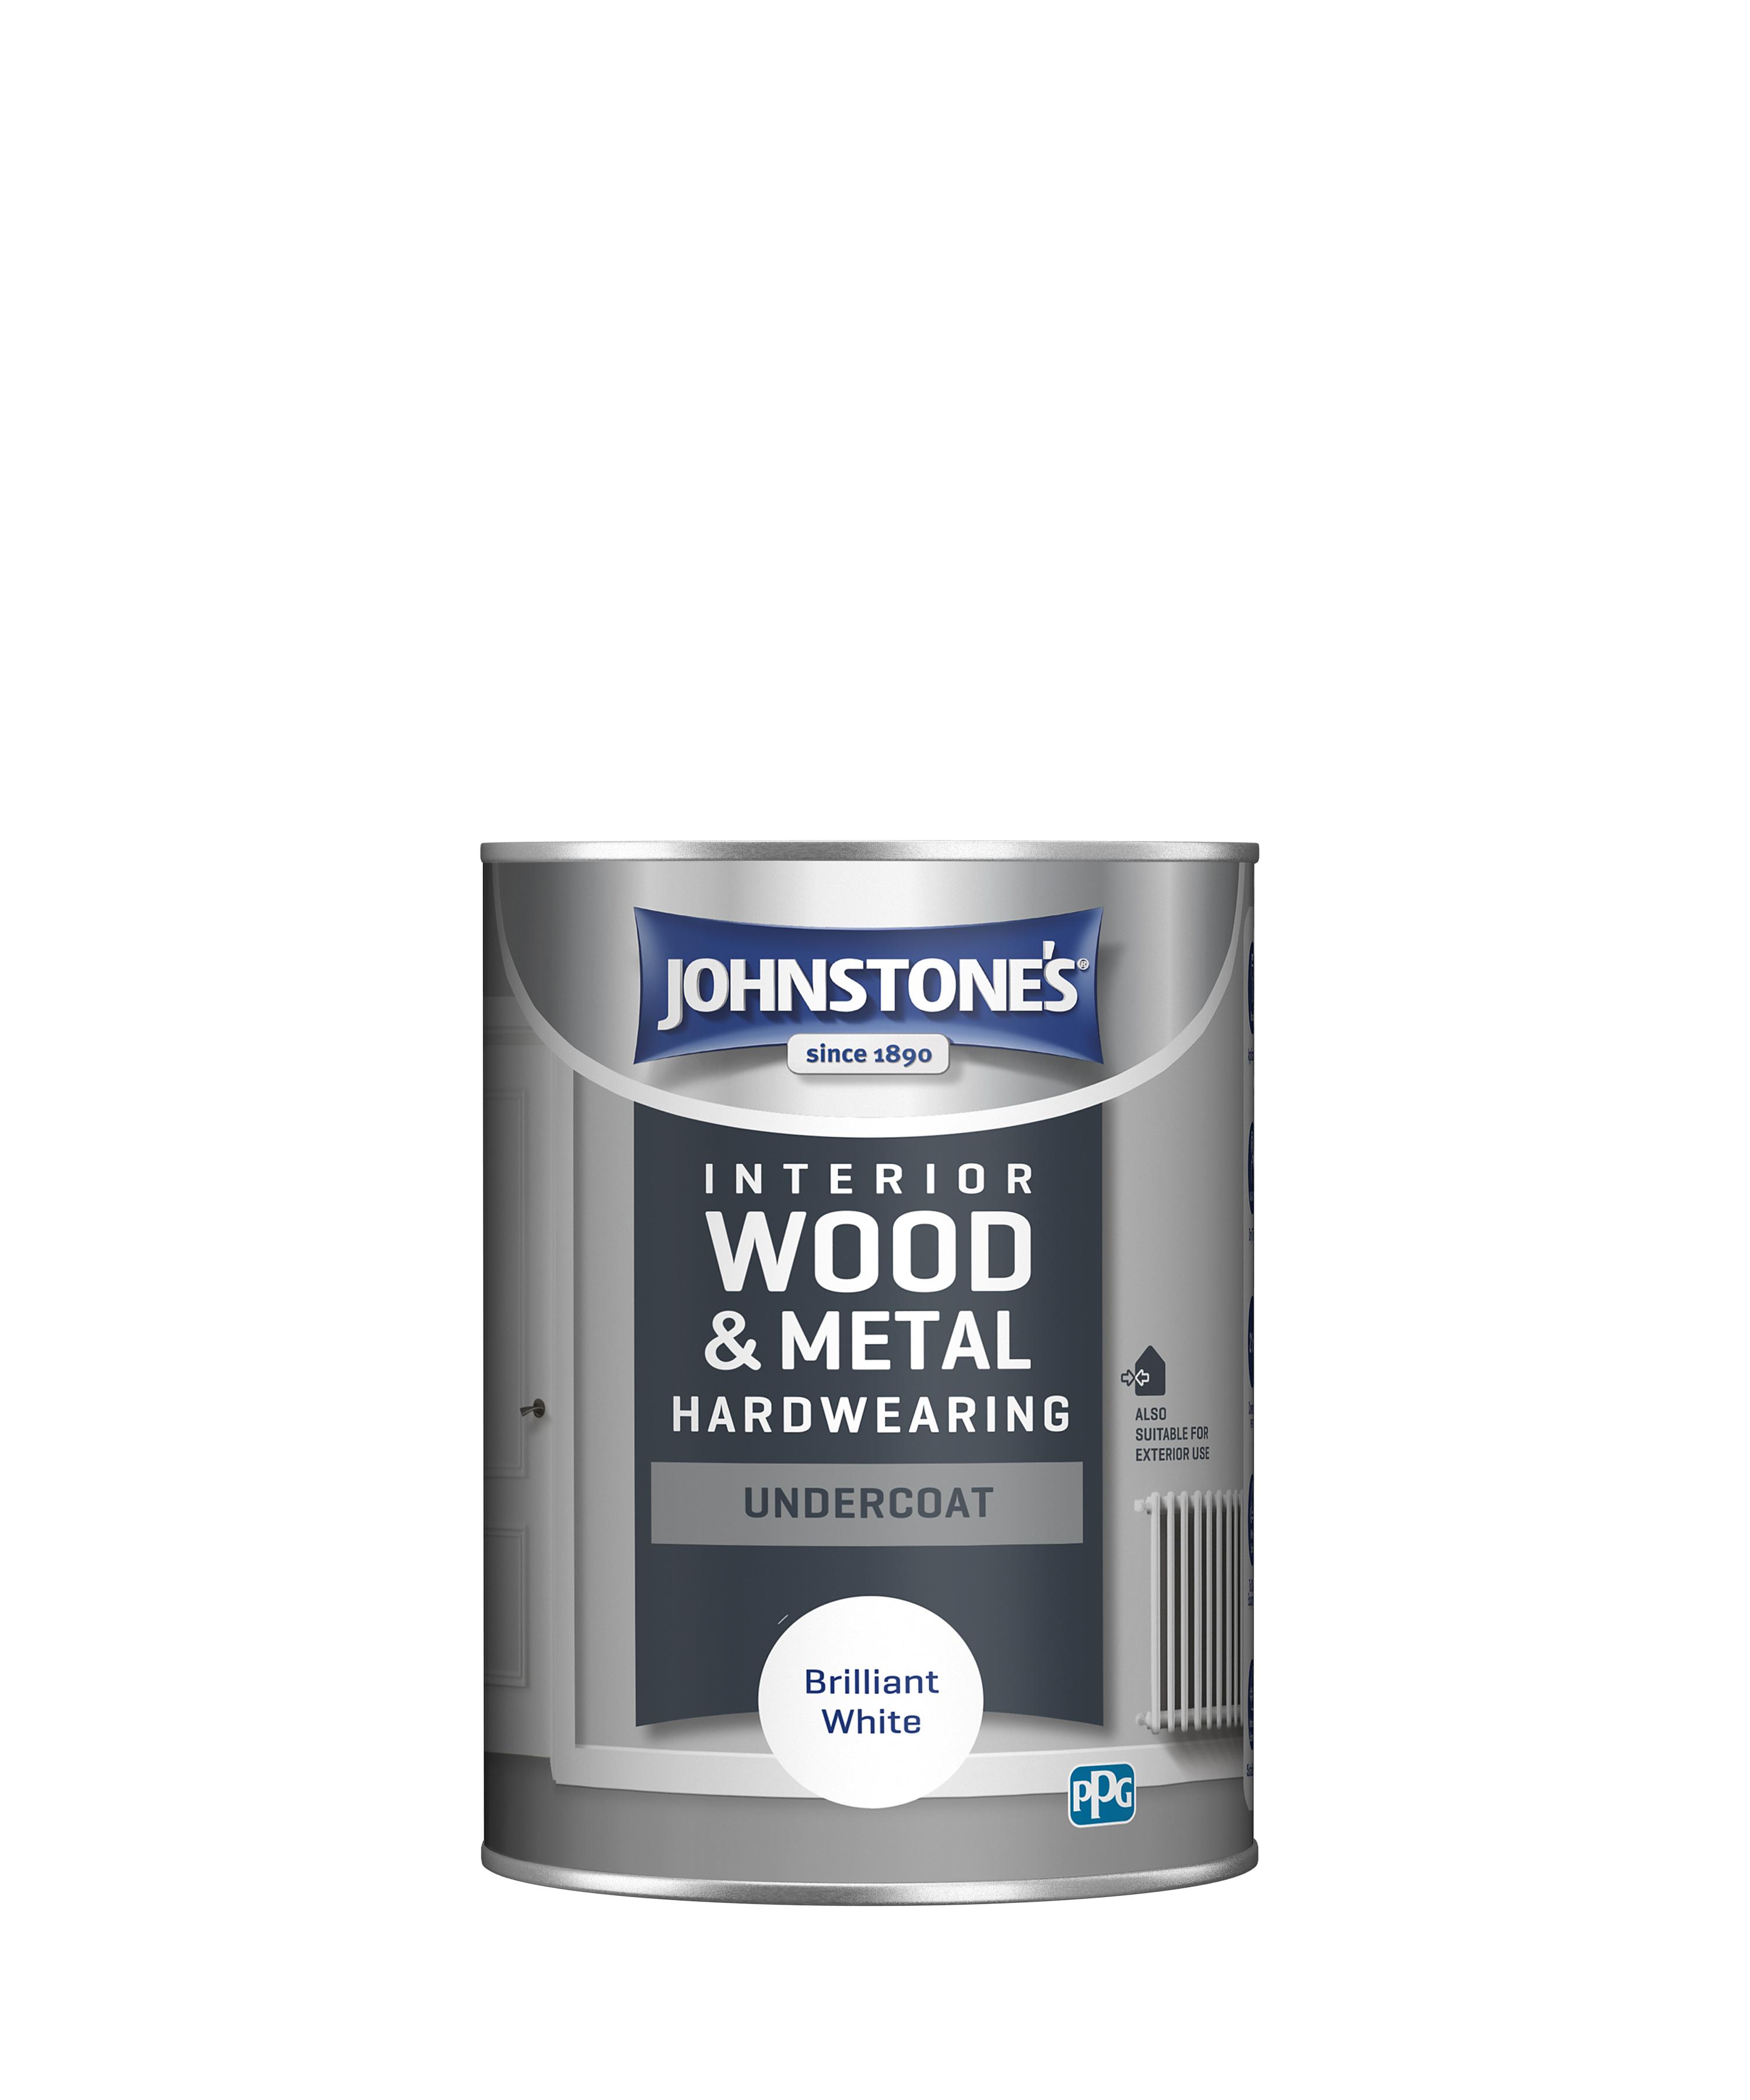 Johnstone's 303903 1.25 Litre All Purpose Undercoat Paint - Brilliant White